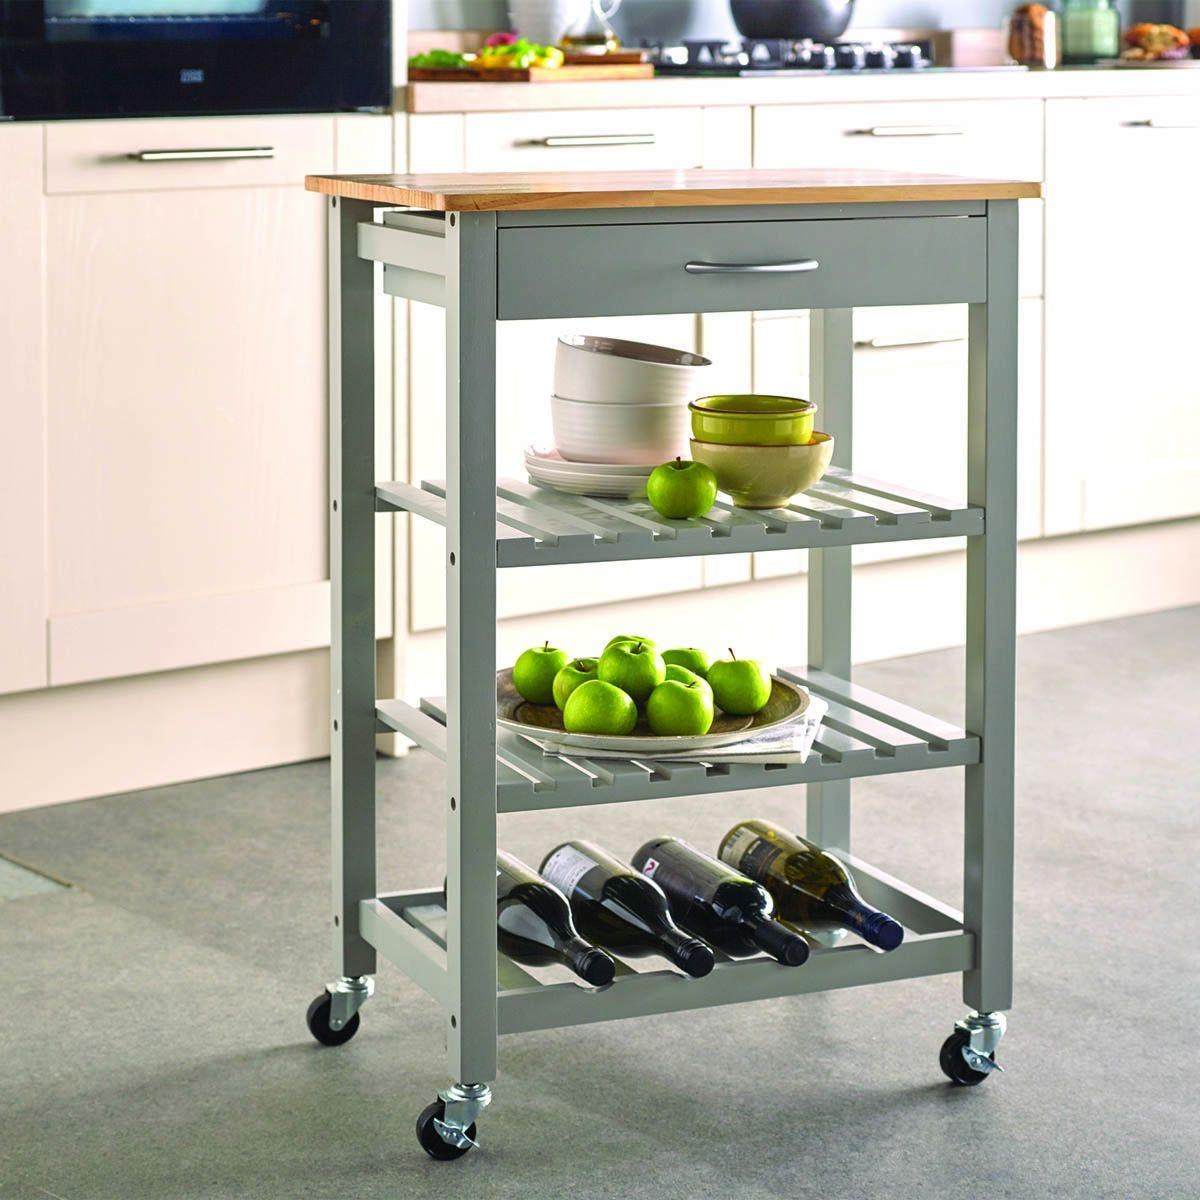 Robert Dyas Contemporary Kitchen Trolley - Grey